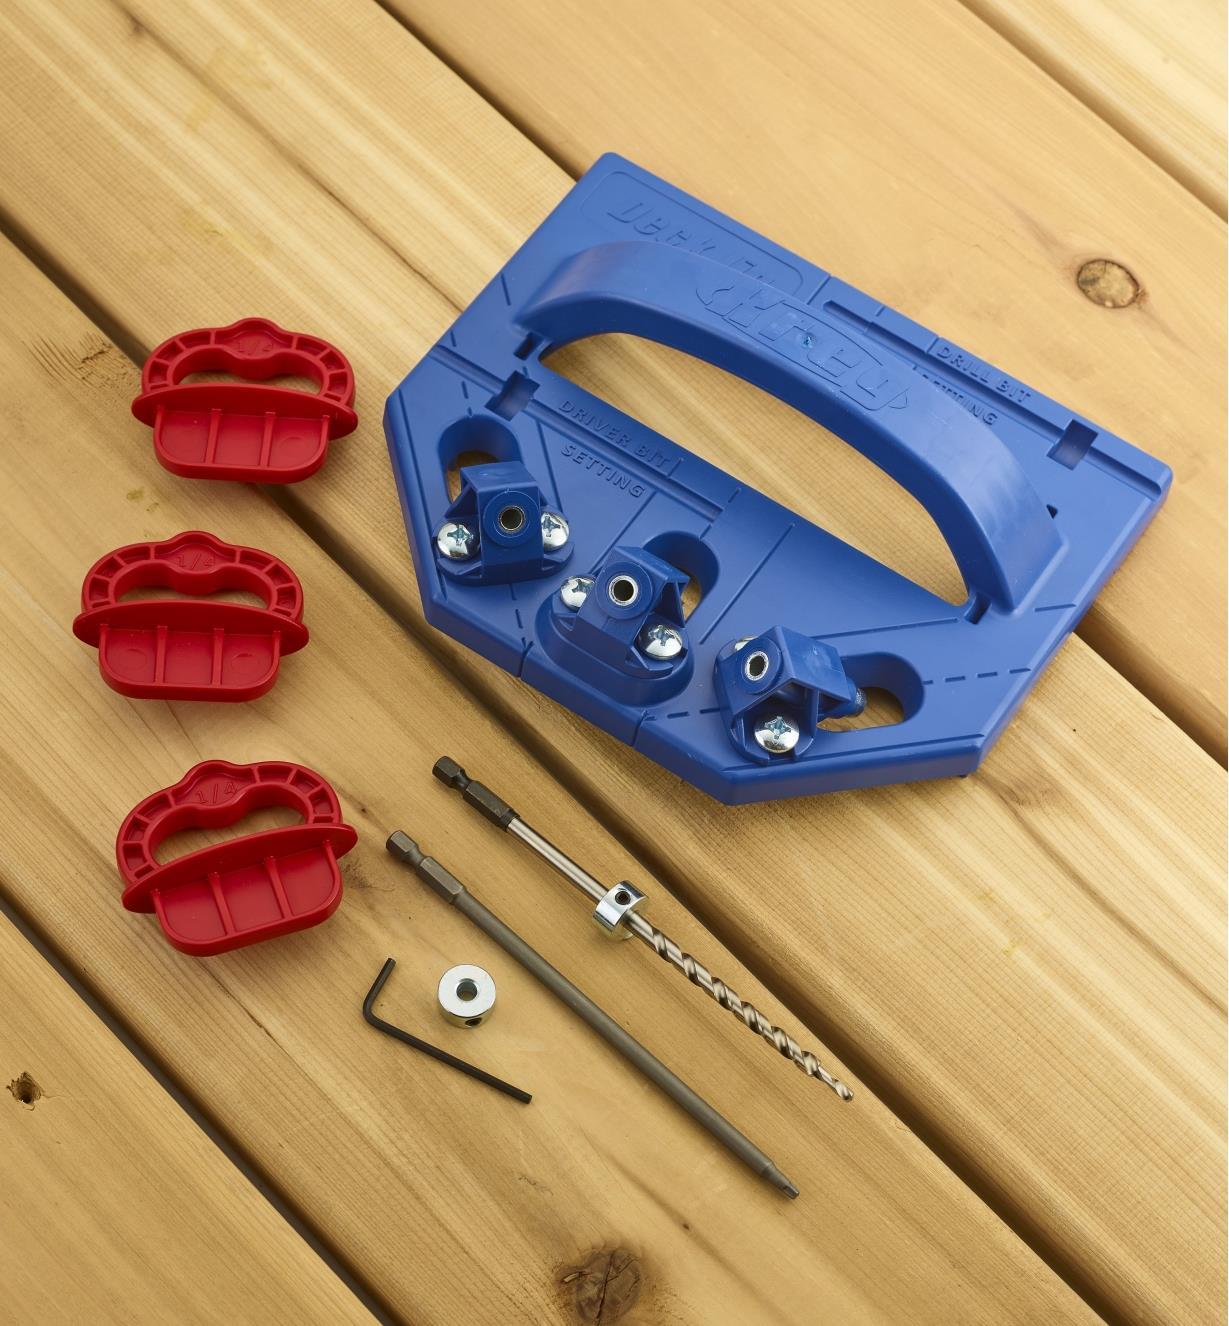 25K6090 - Kreg Deck Jig Kit